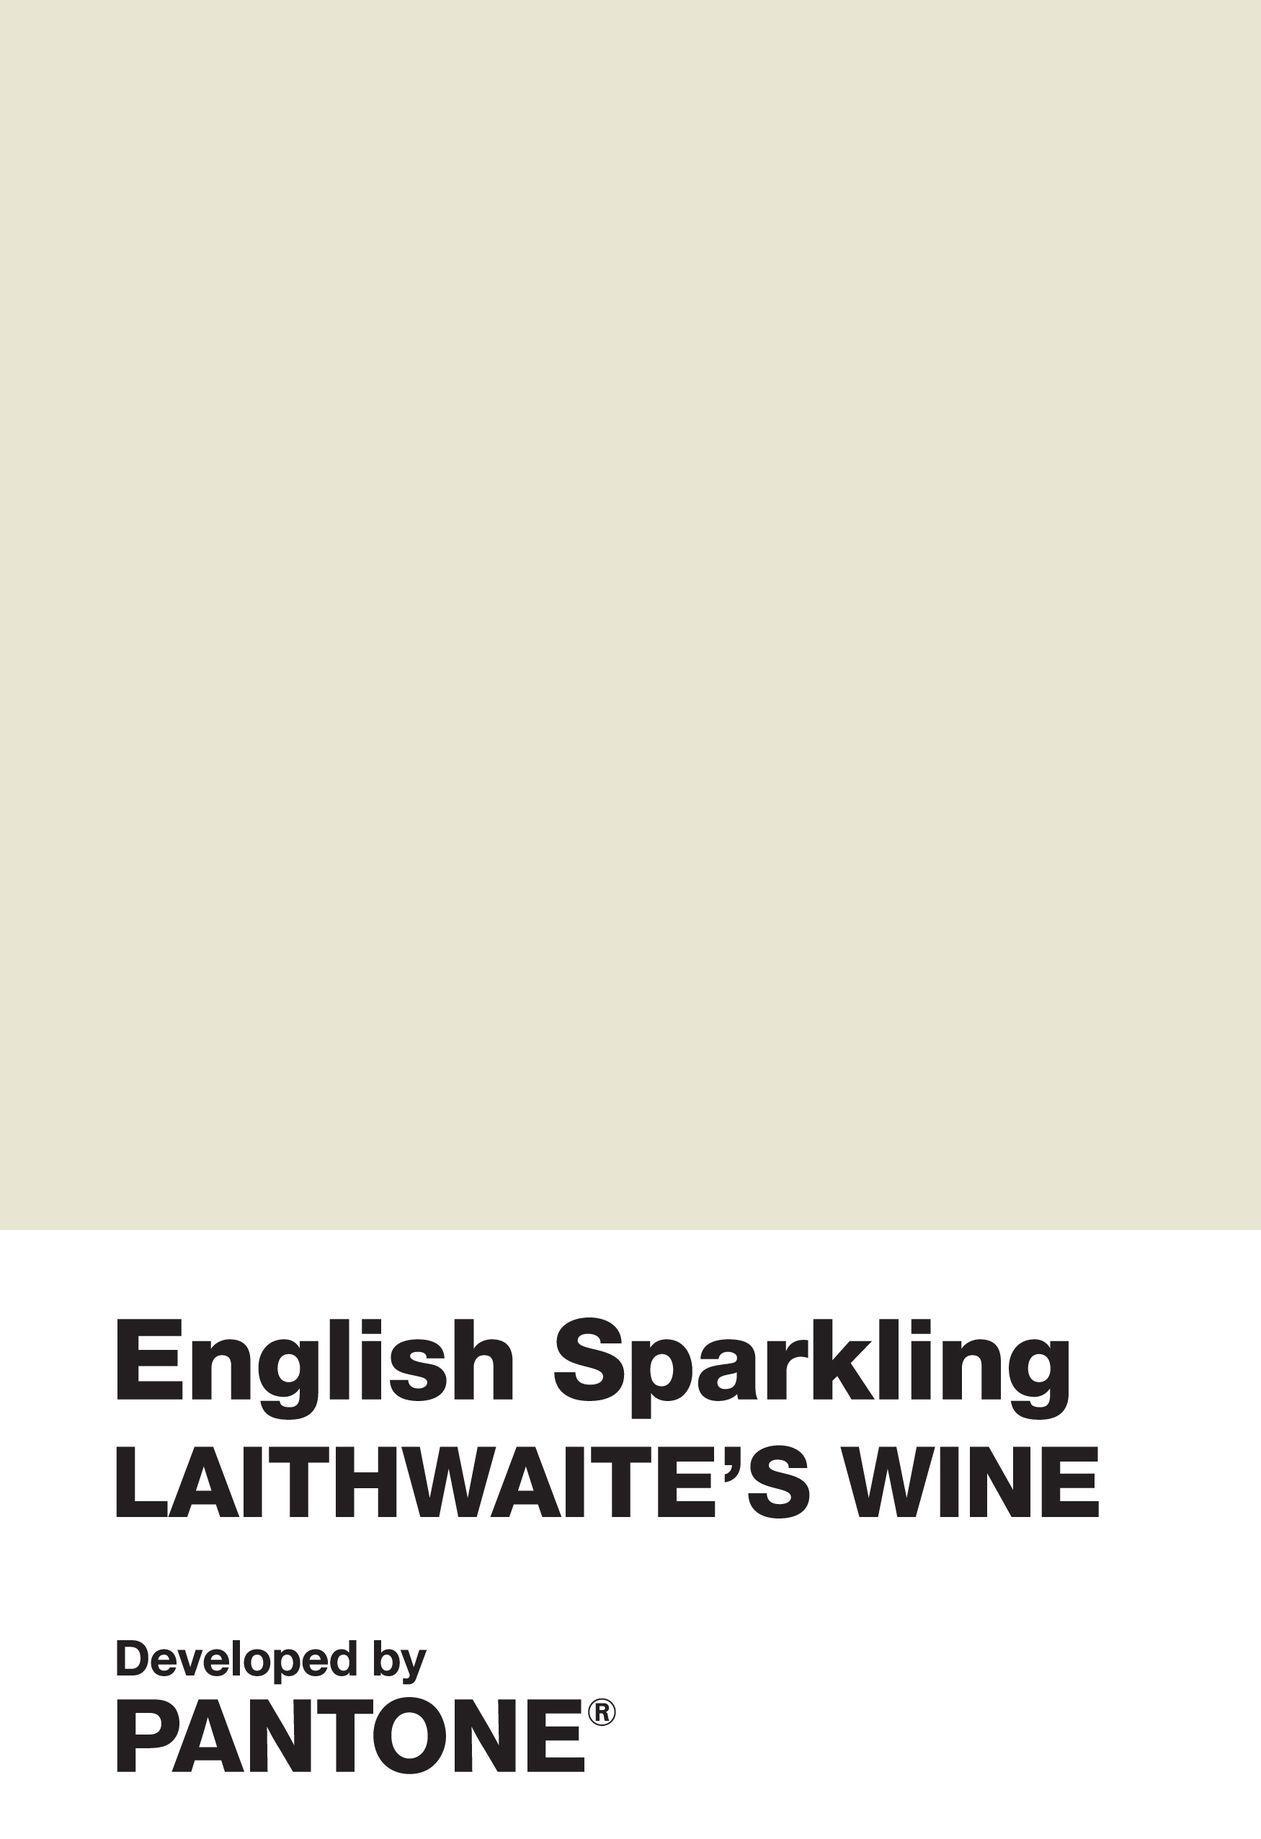 pantone nuovo colore, english sparkling wine